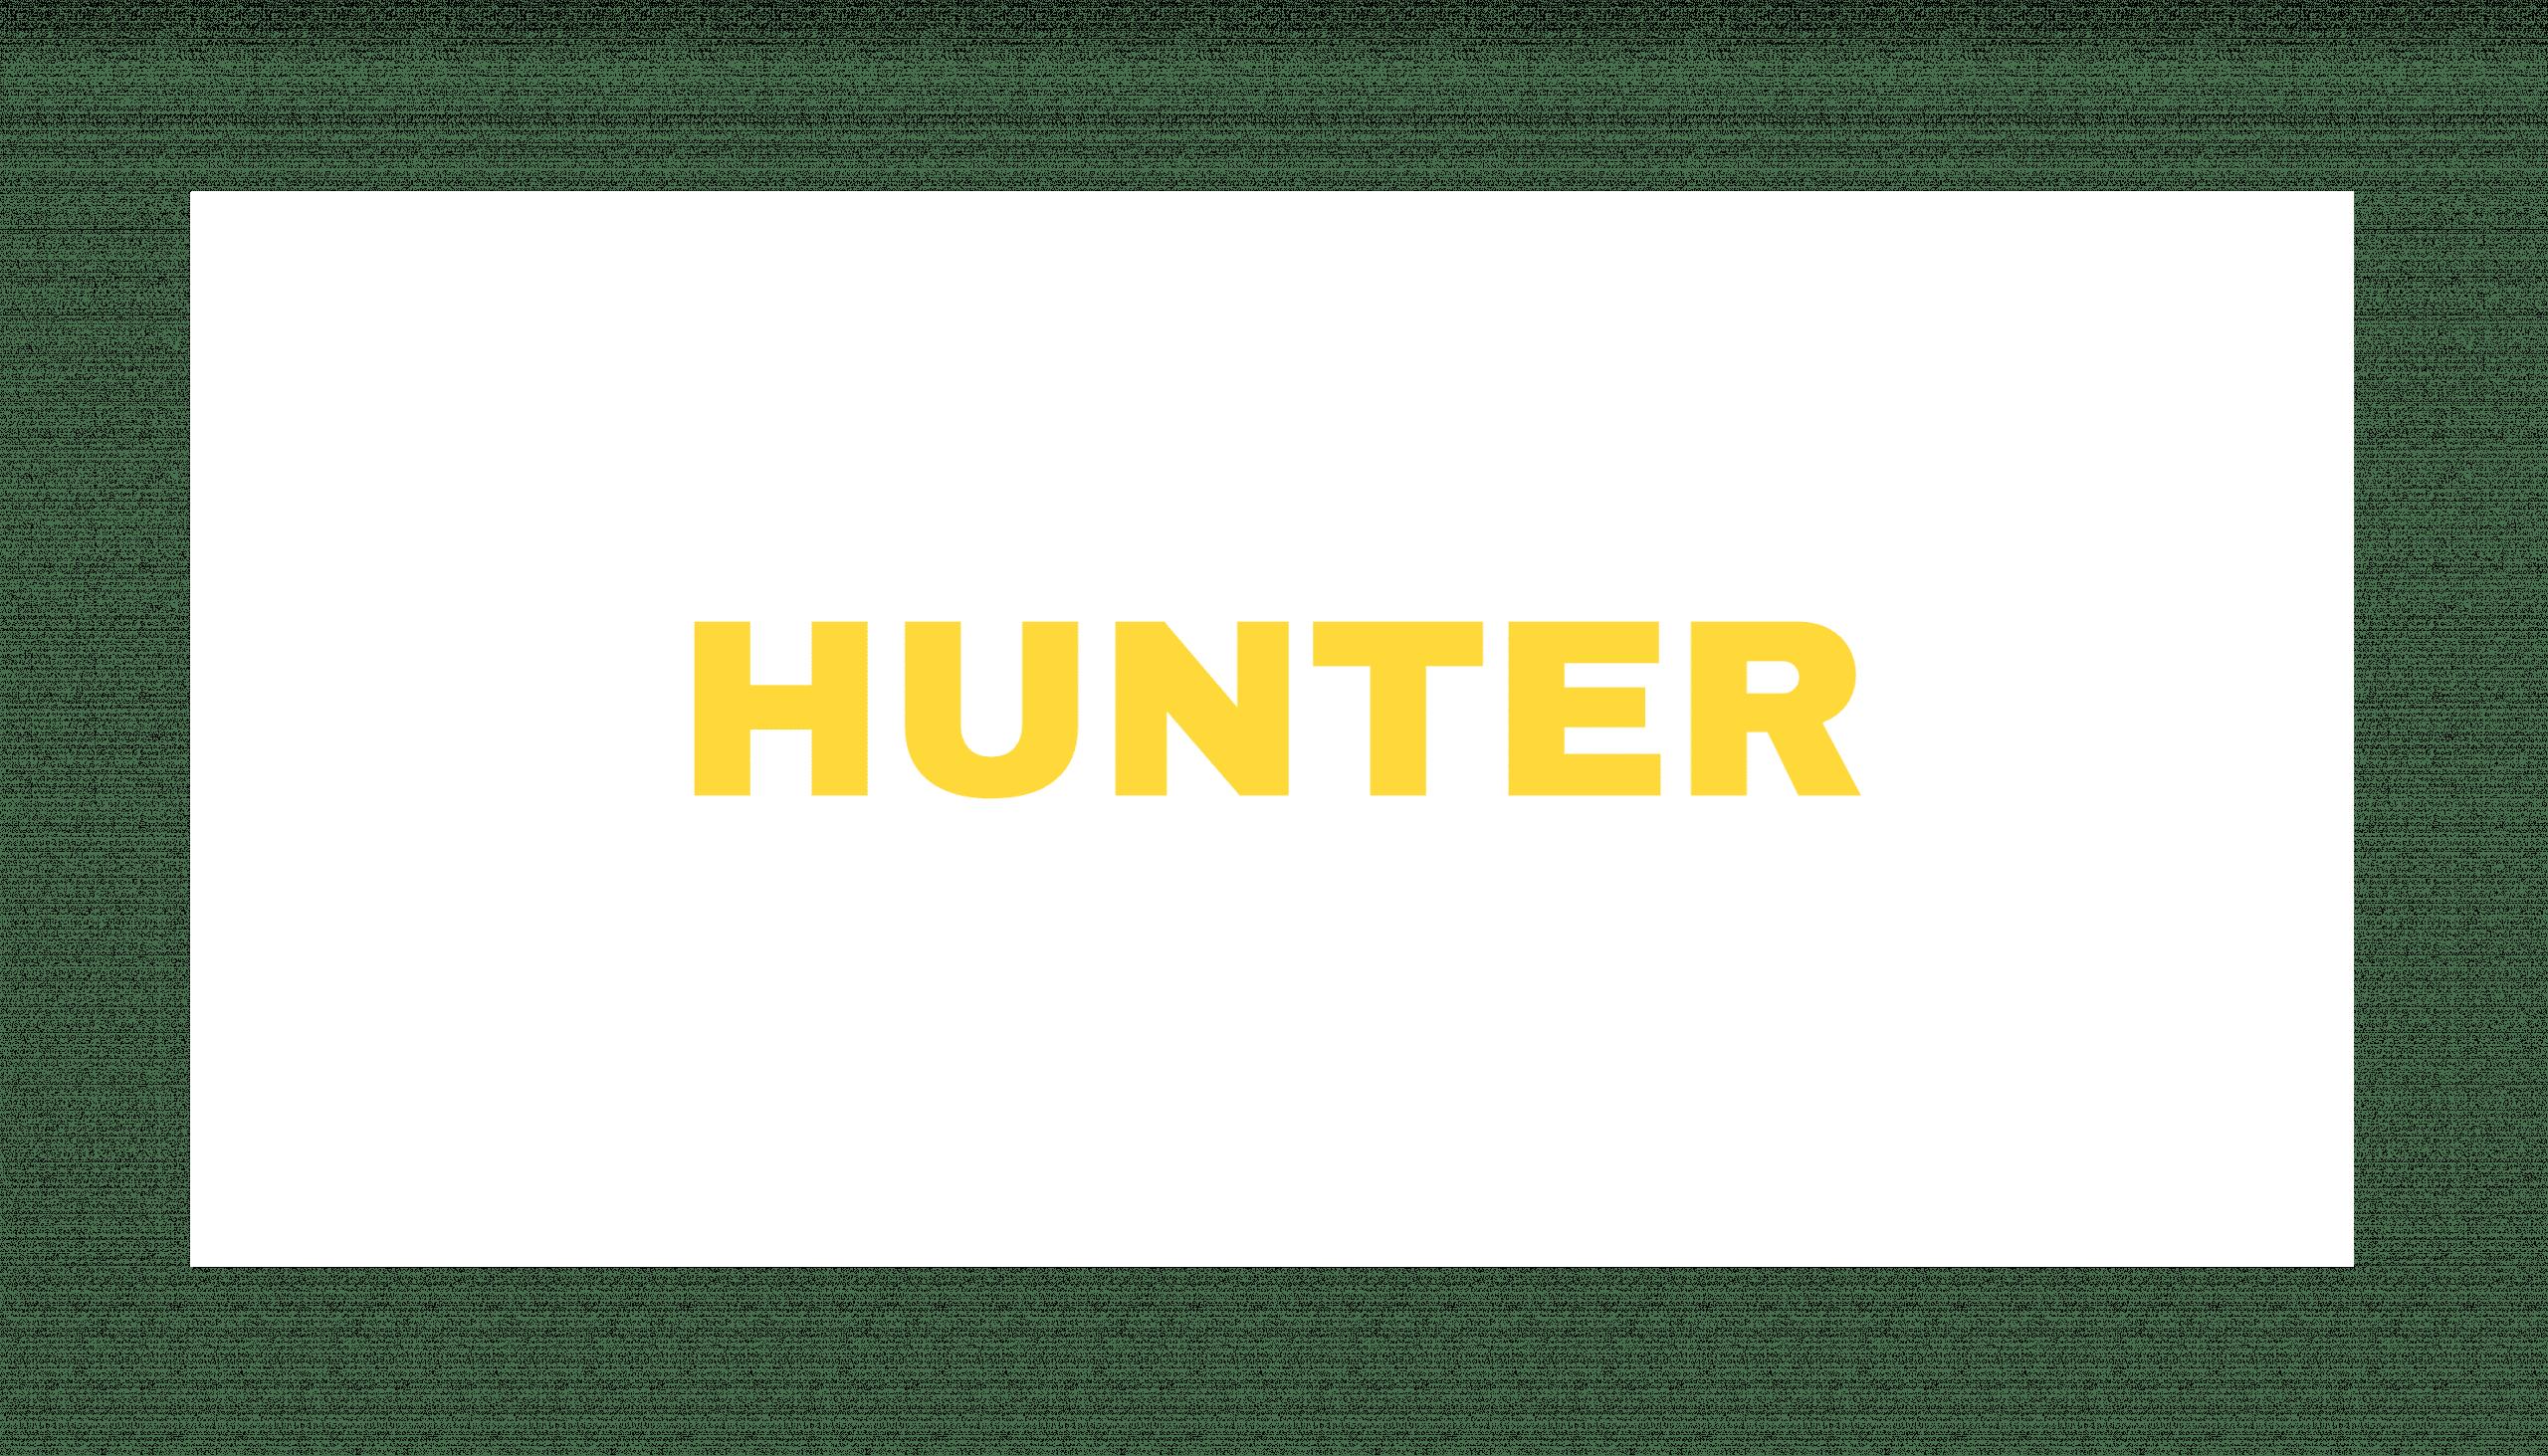 Hunter 491 Skilled Occupation List